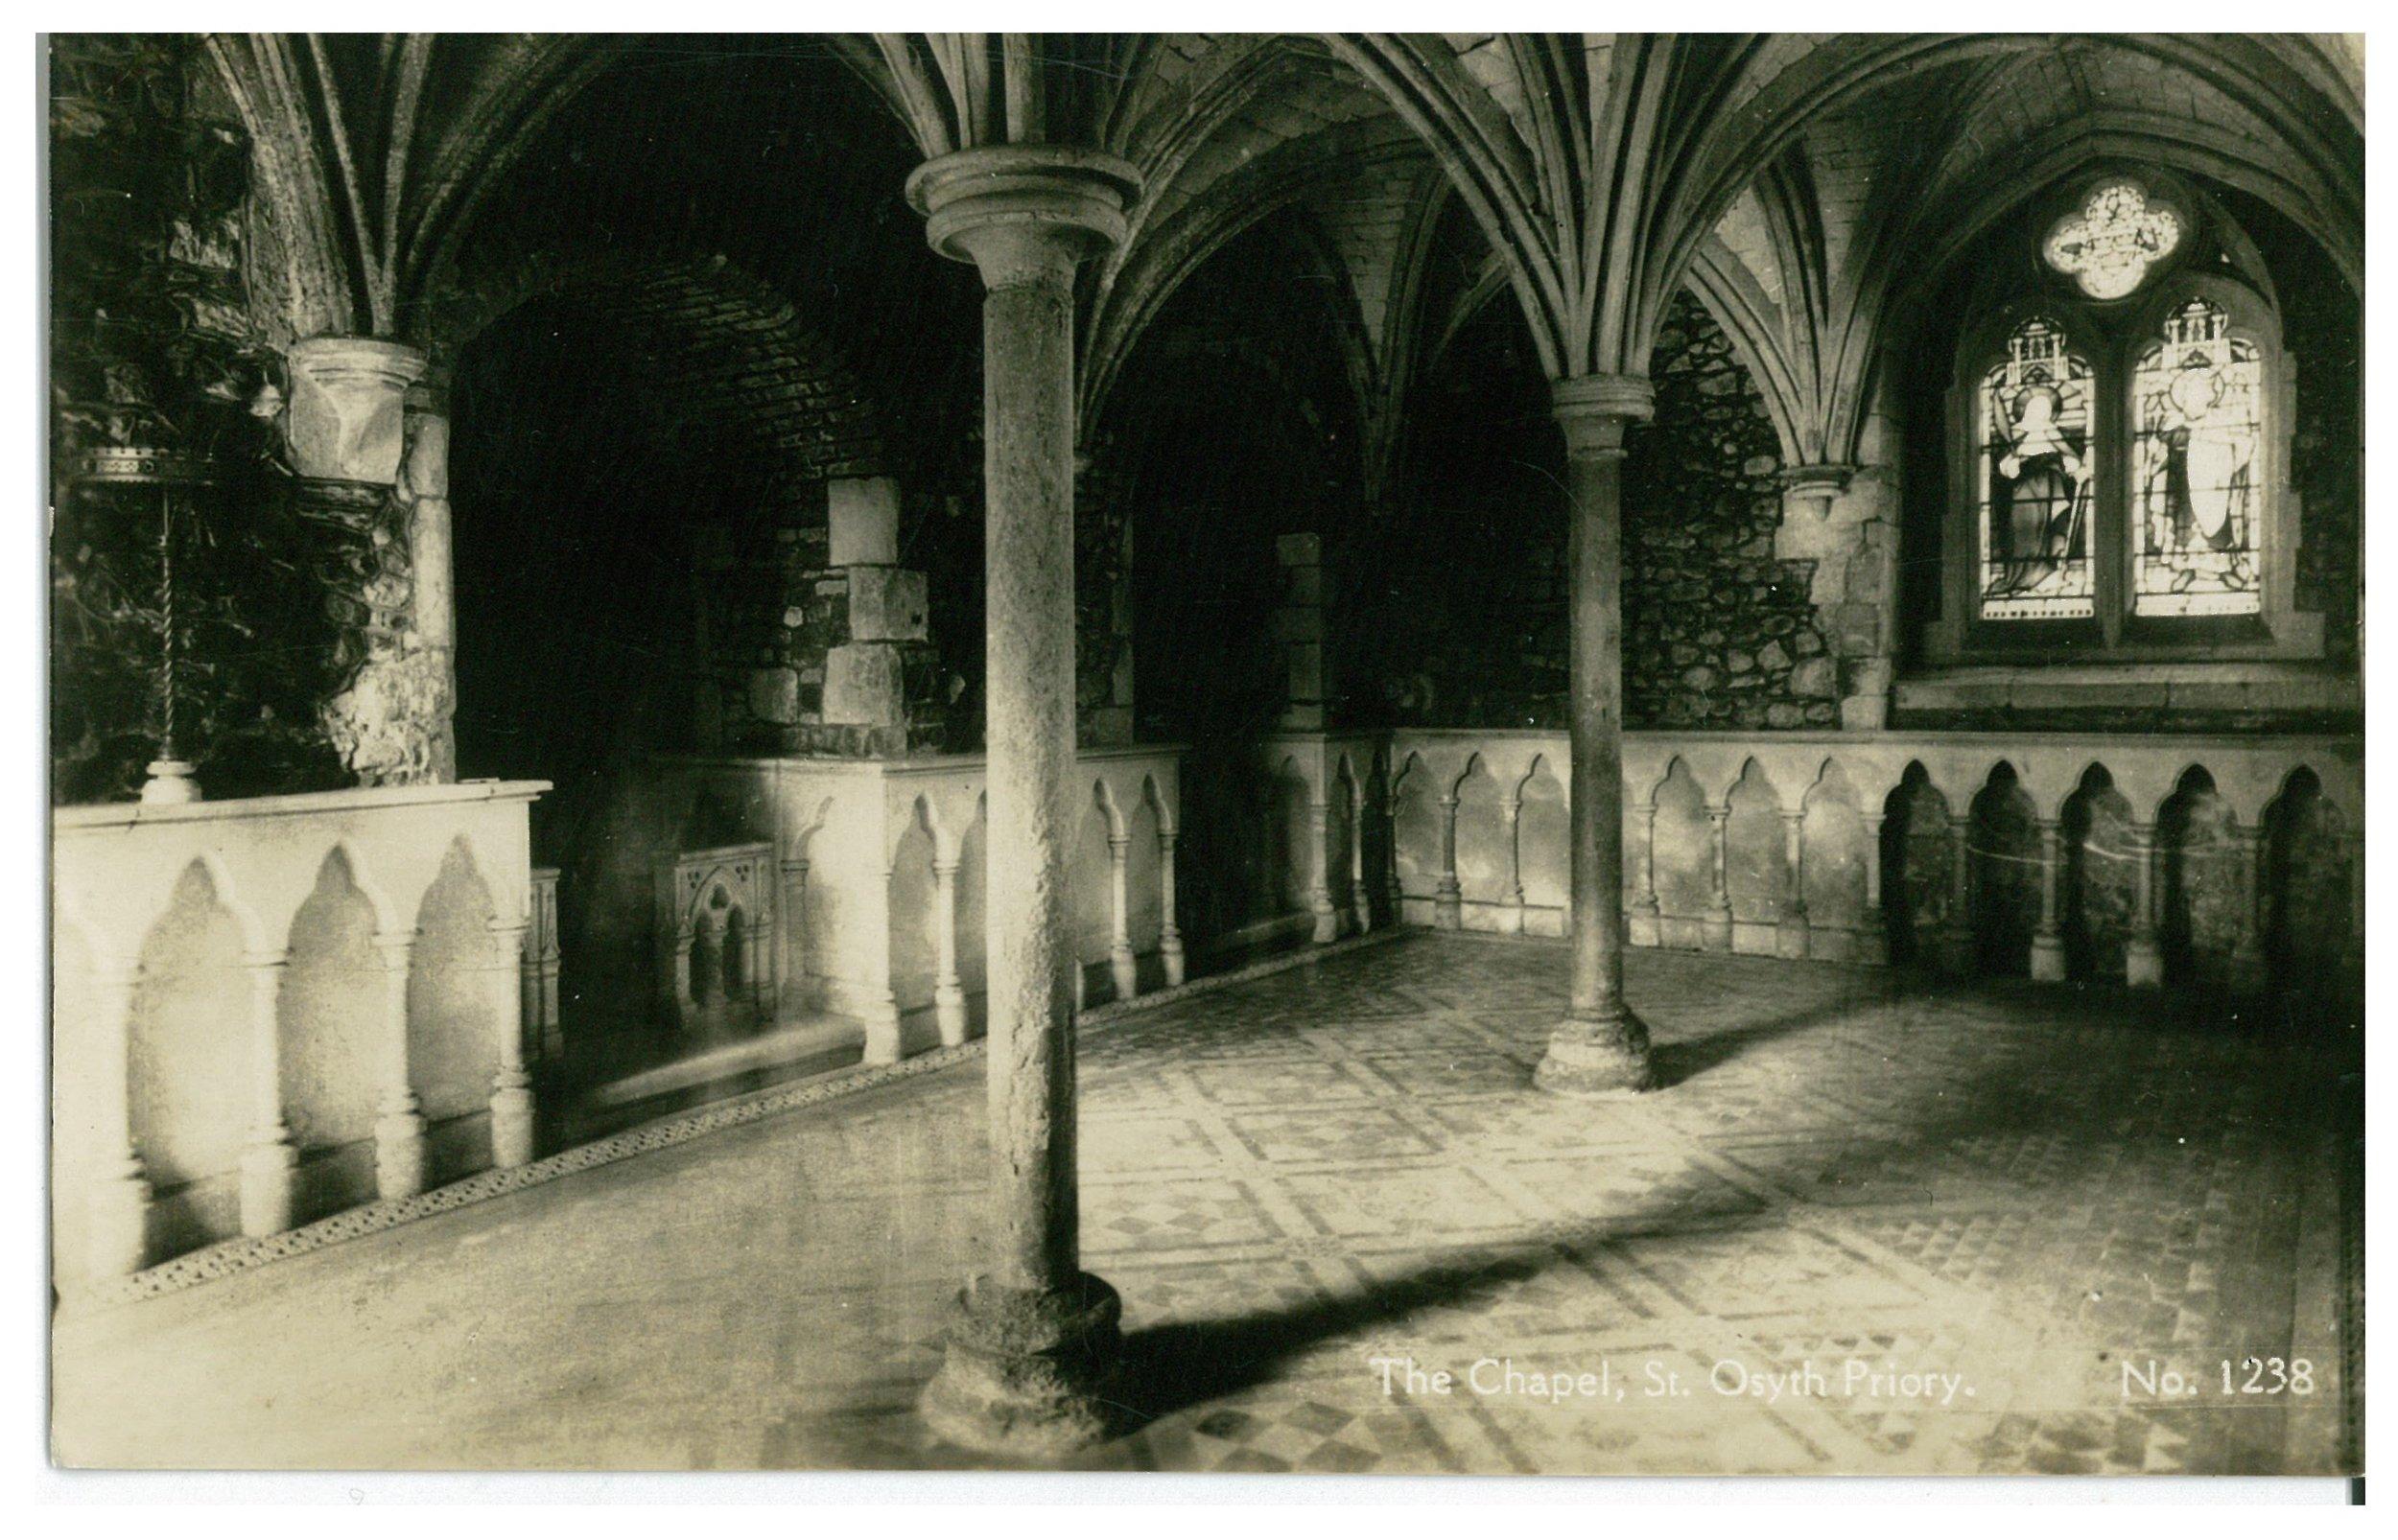 St Osyth - The Chapel 1937.JPG